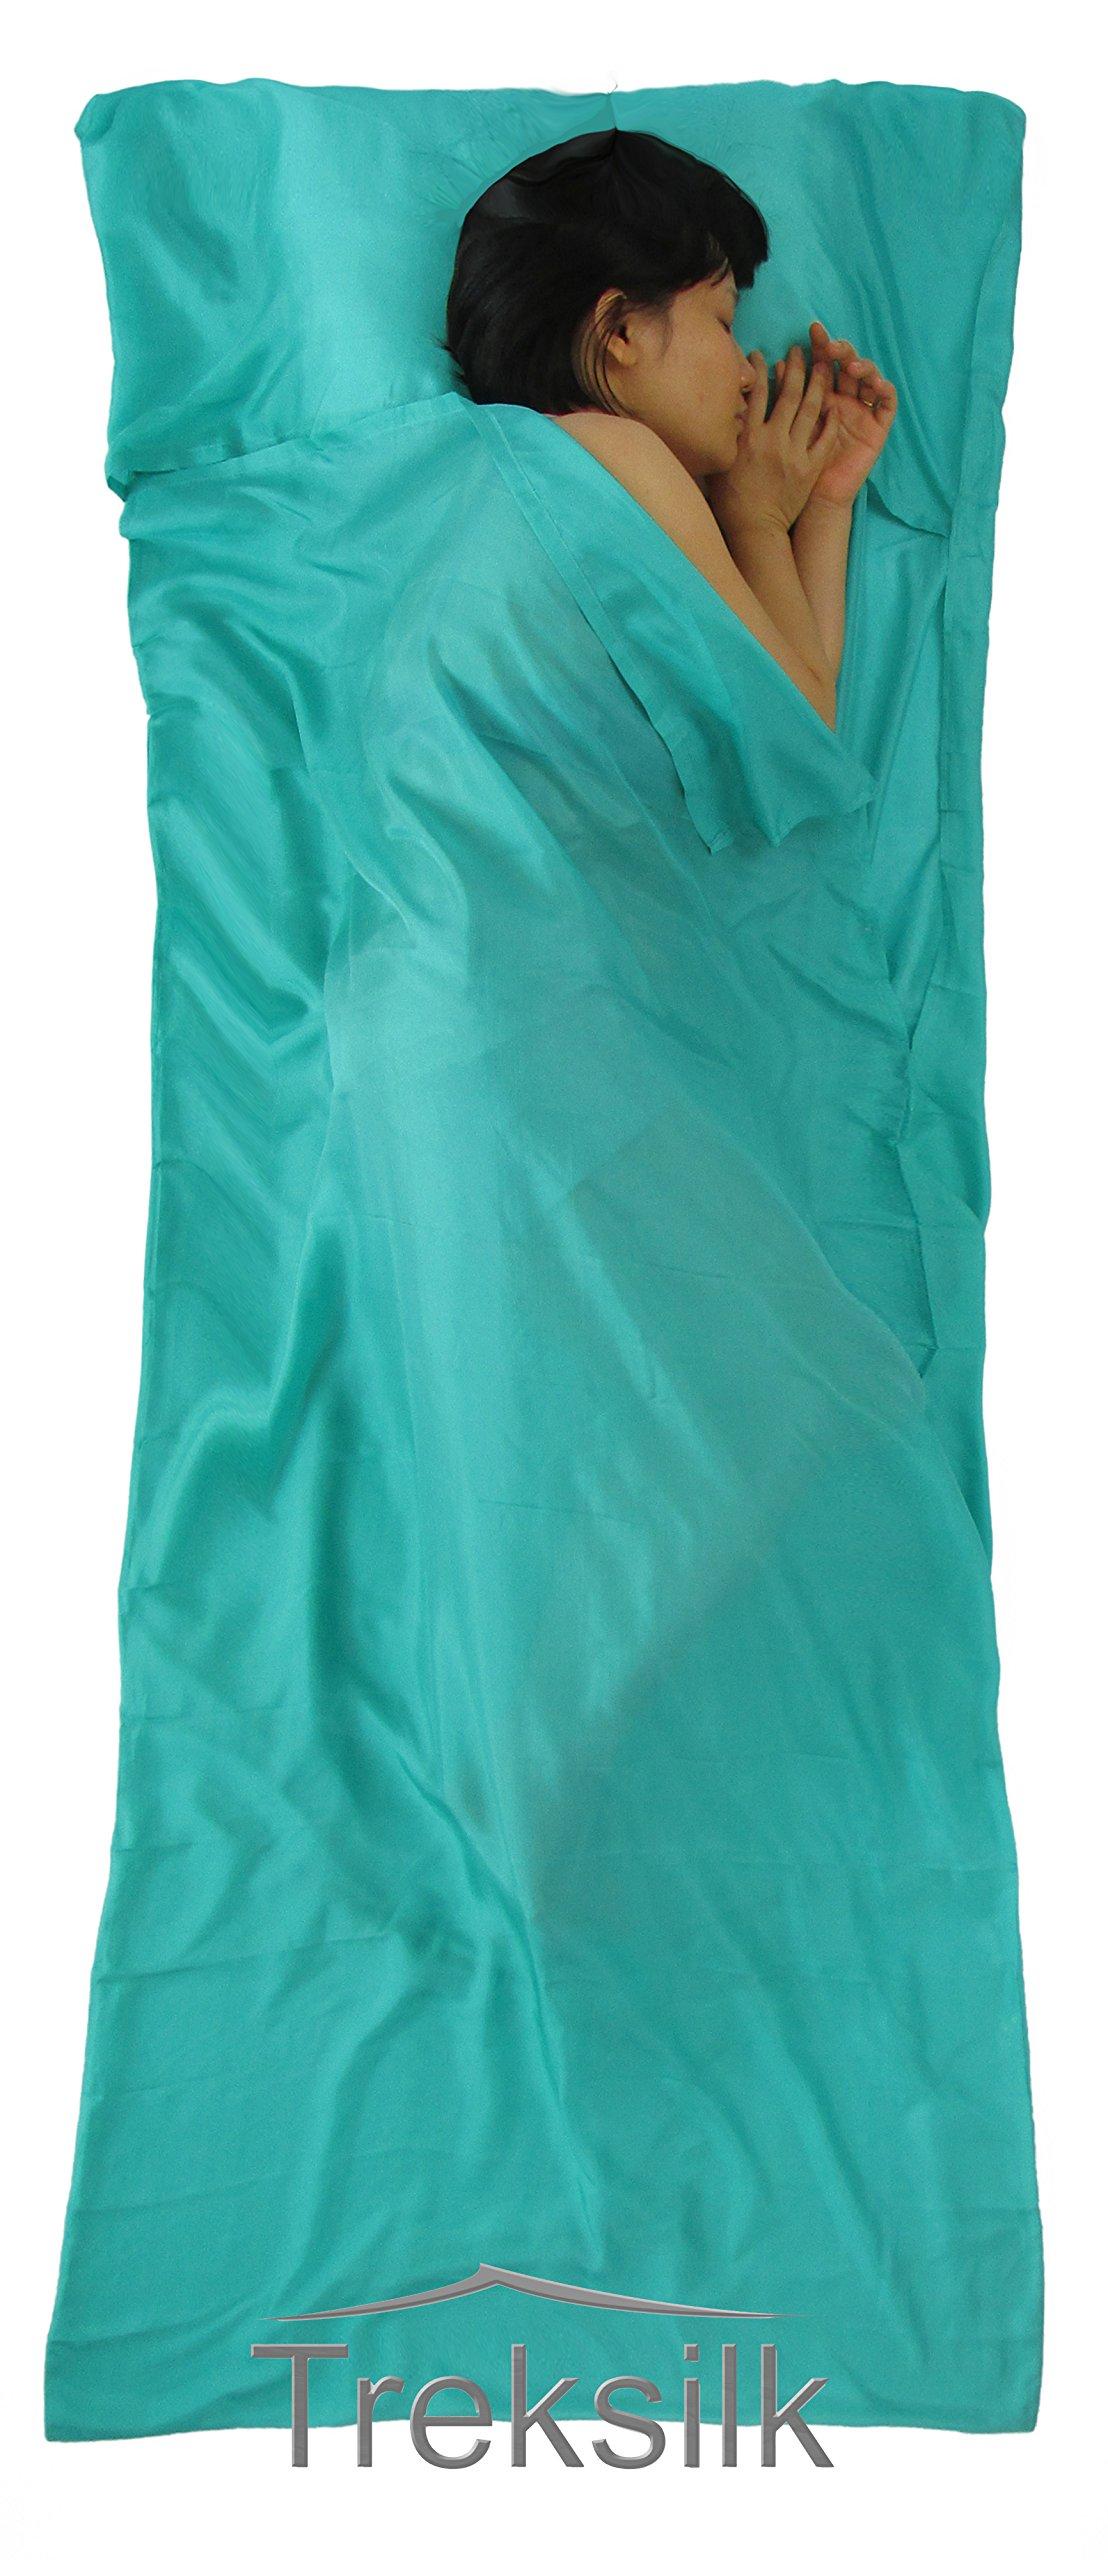 Treksilk: 240 cm! 100% Mulberry Silk Single Sleeping Bag Liner Travel Sheet Sack (Turquoise) by Treksilk